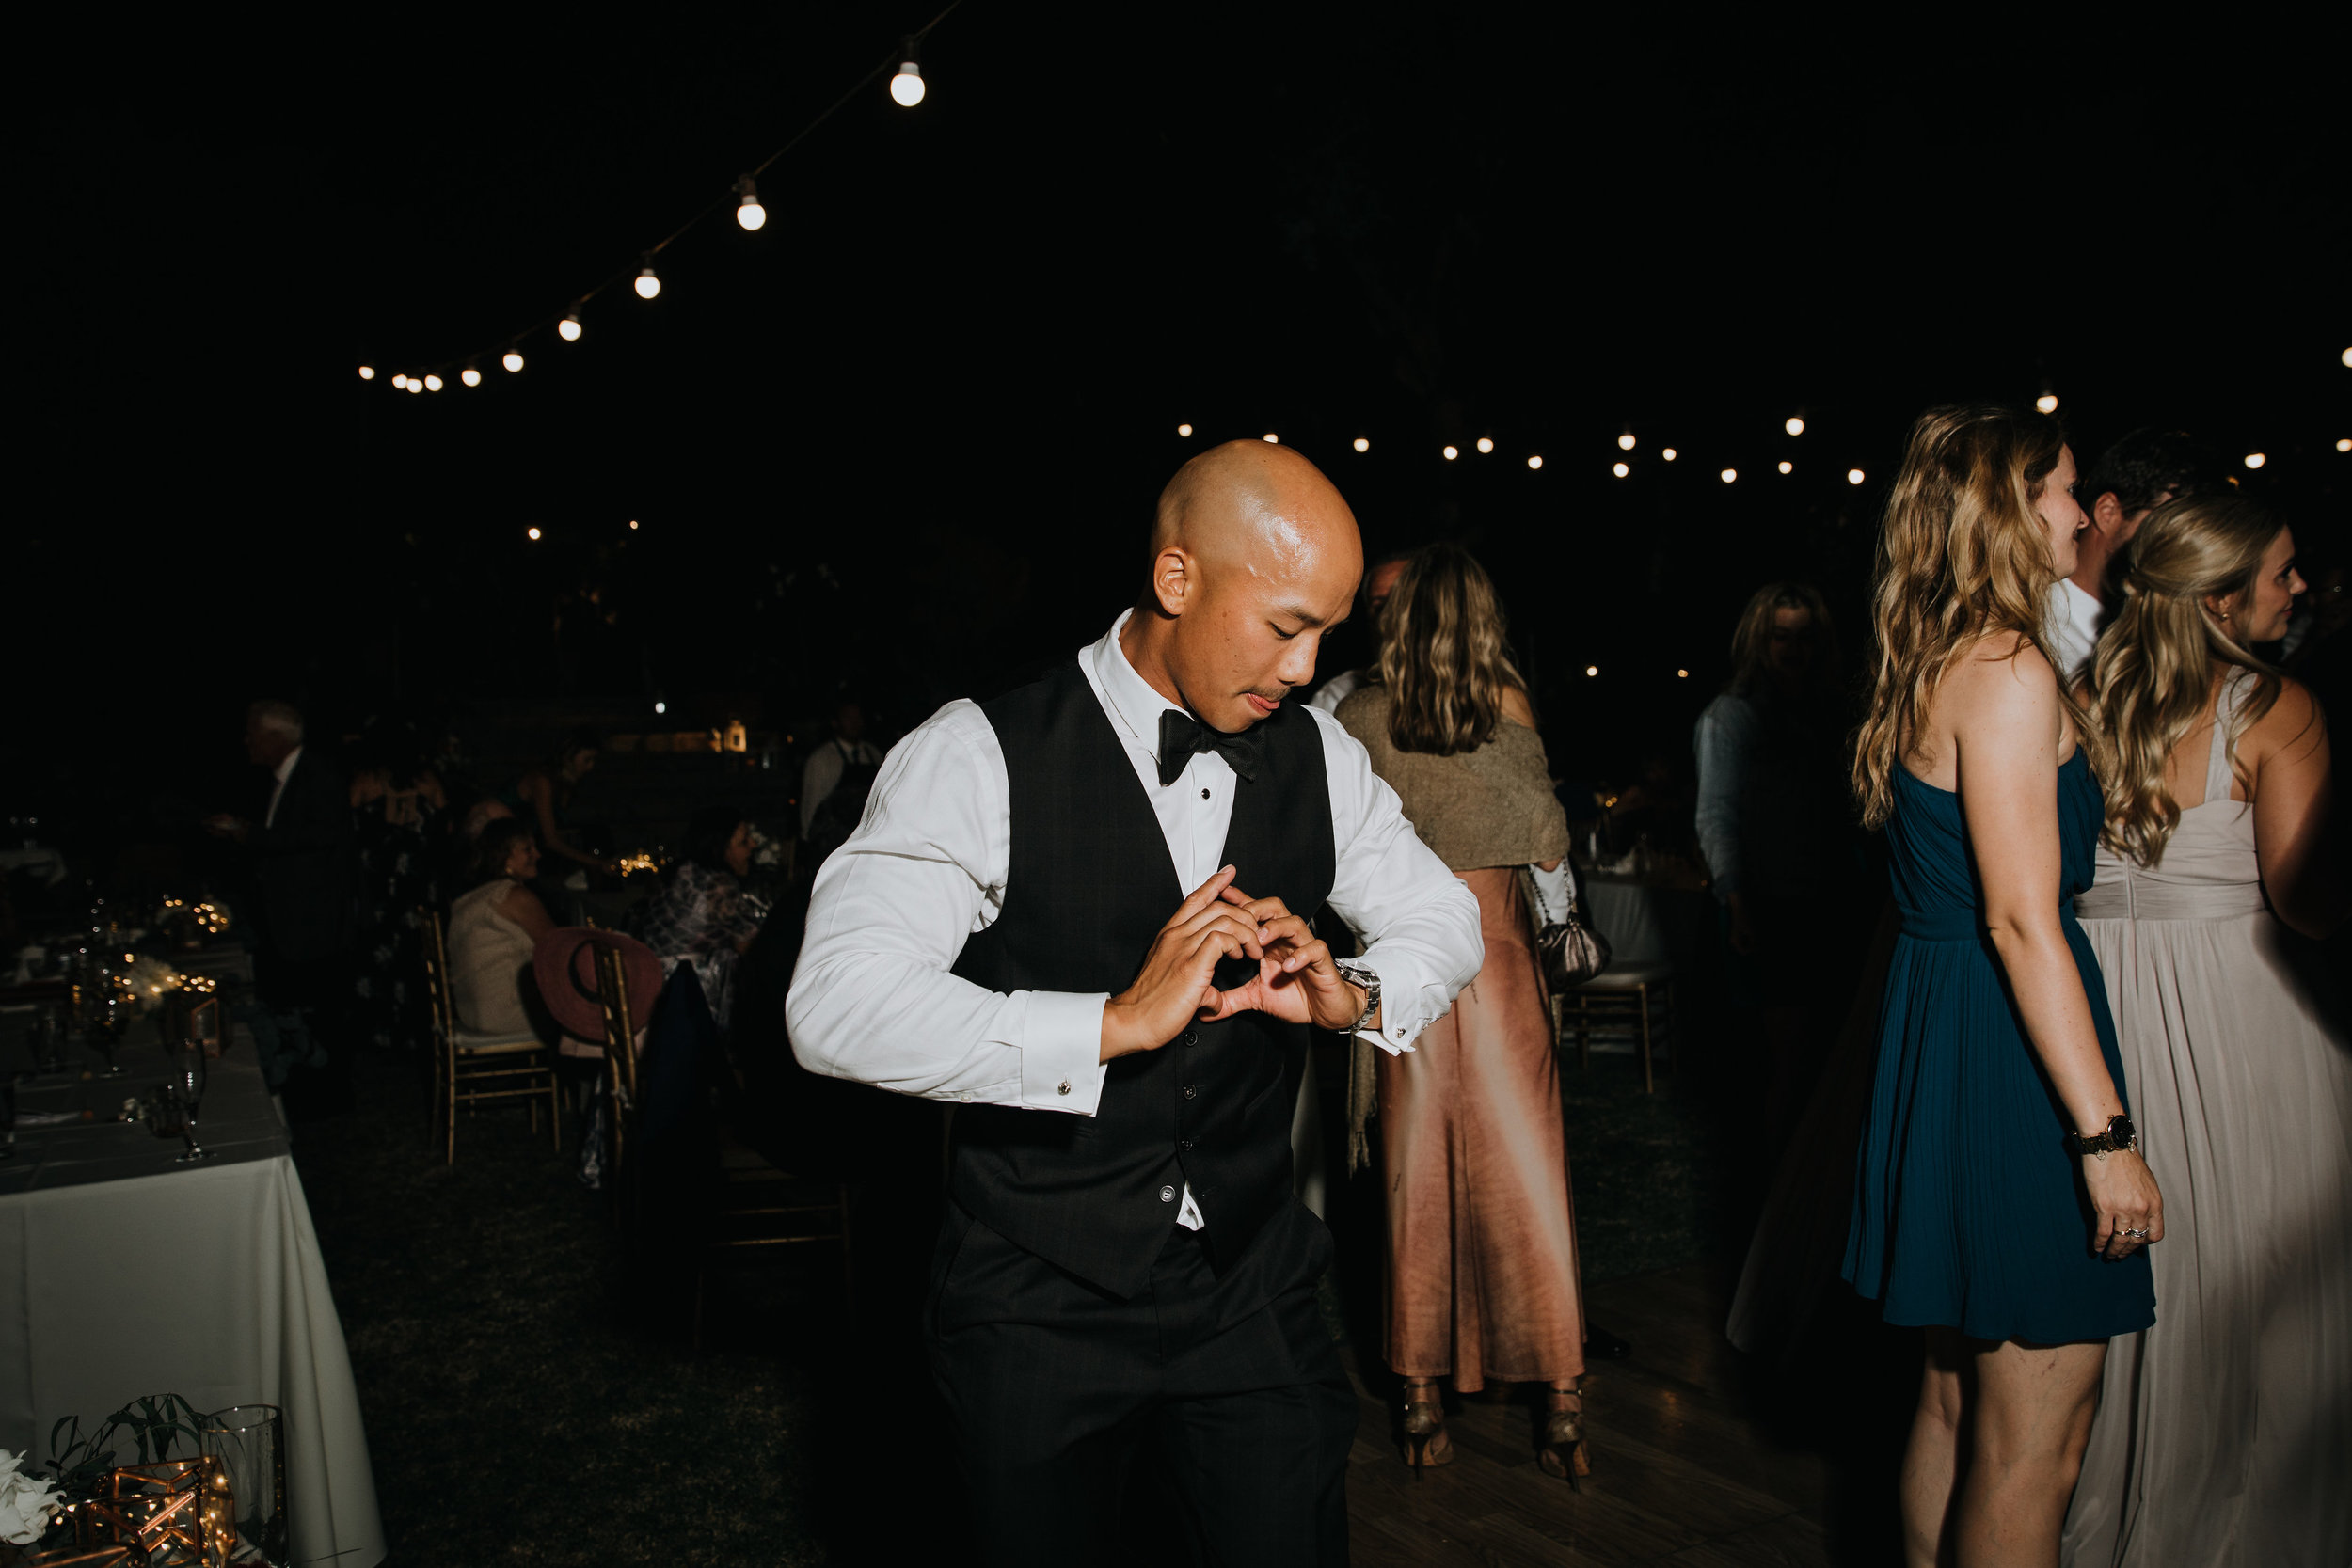 Rancho Del Cielo Malibu Socal Wedding May Iosotaluno Photography